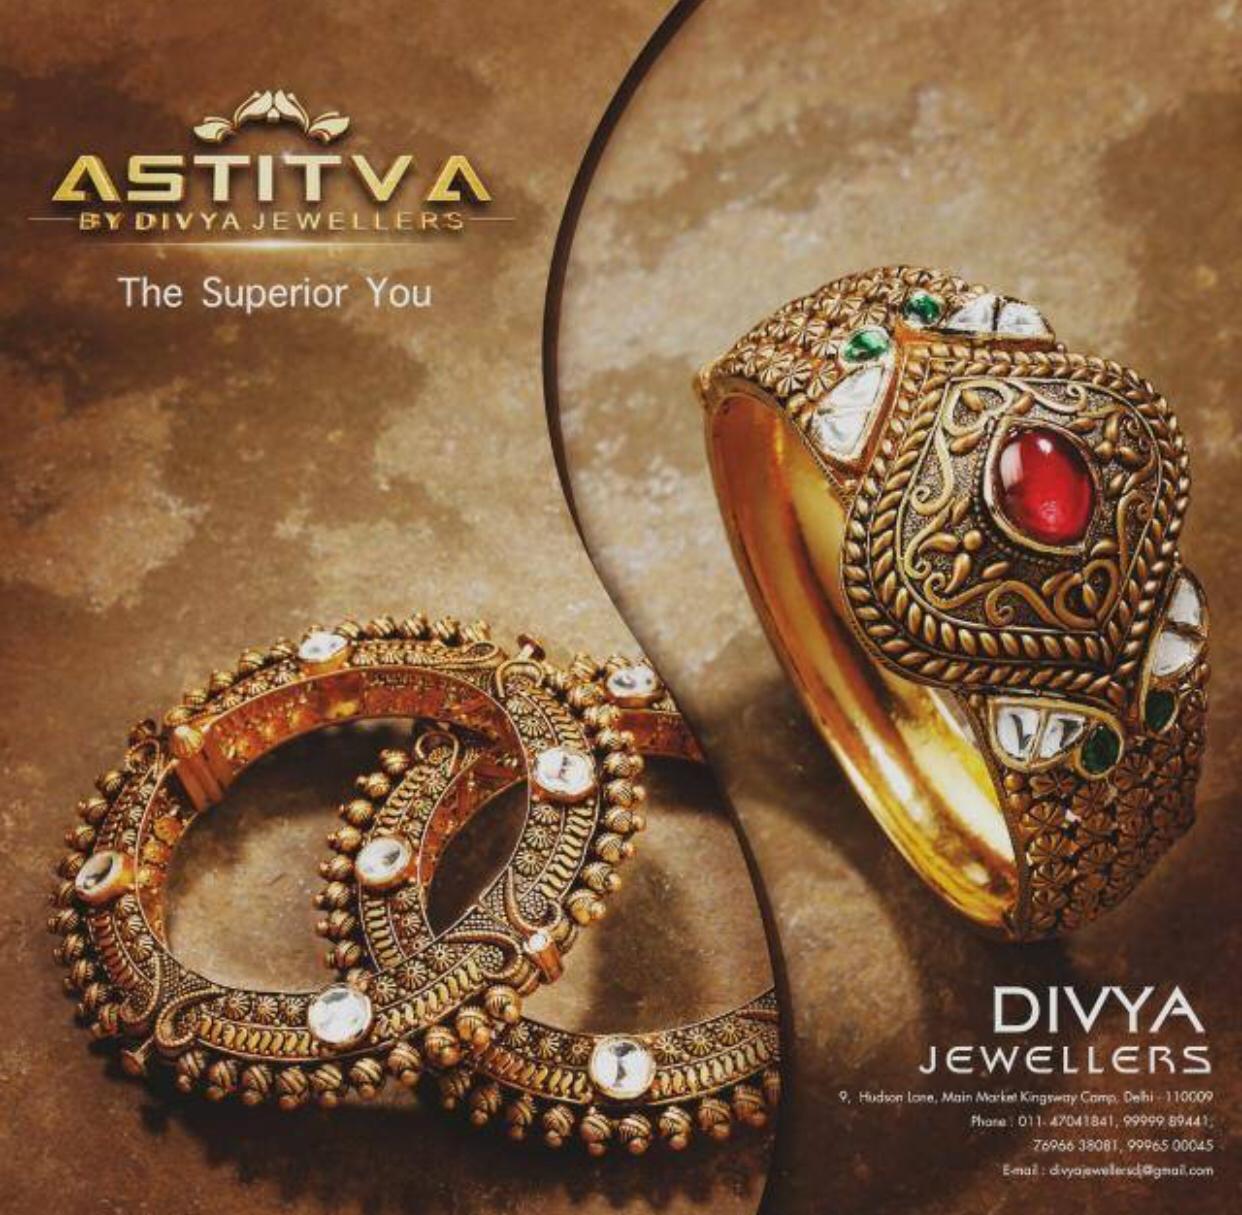 Divya Jewellers